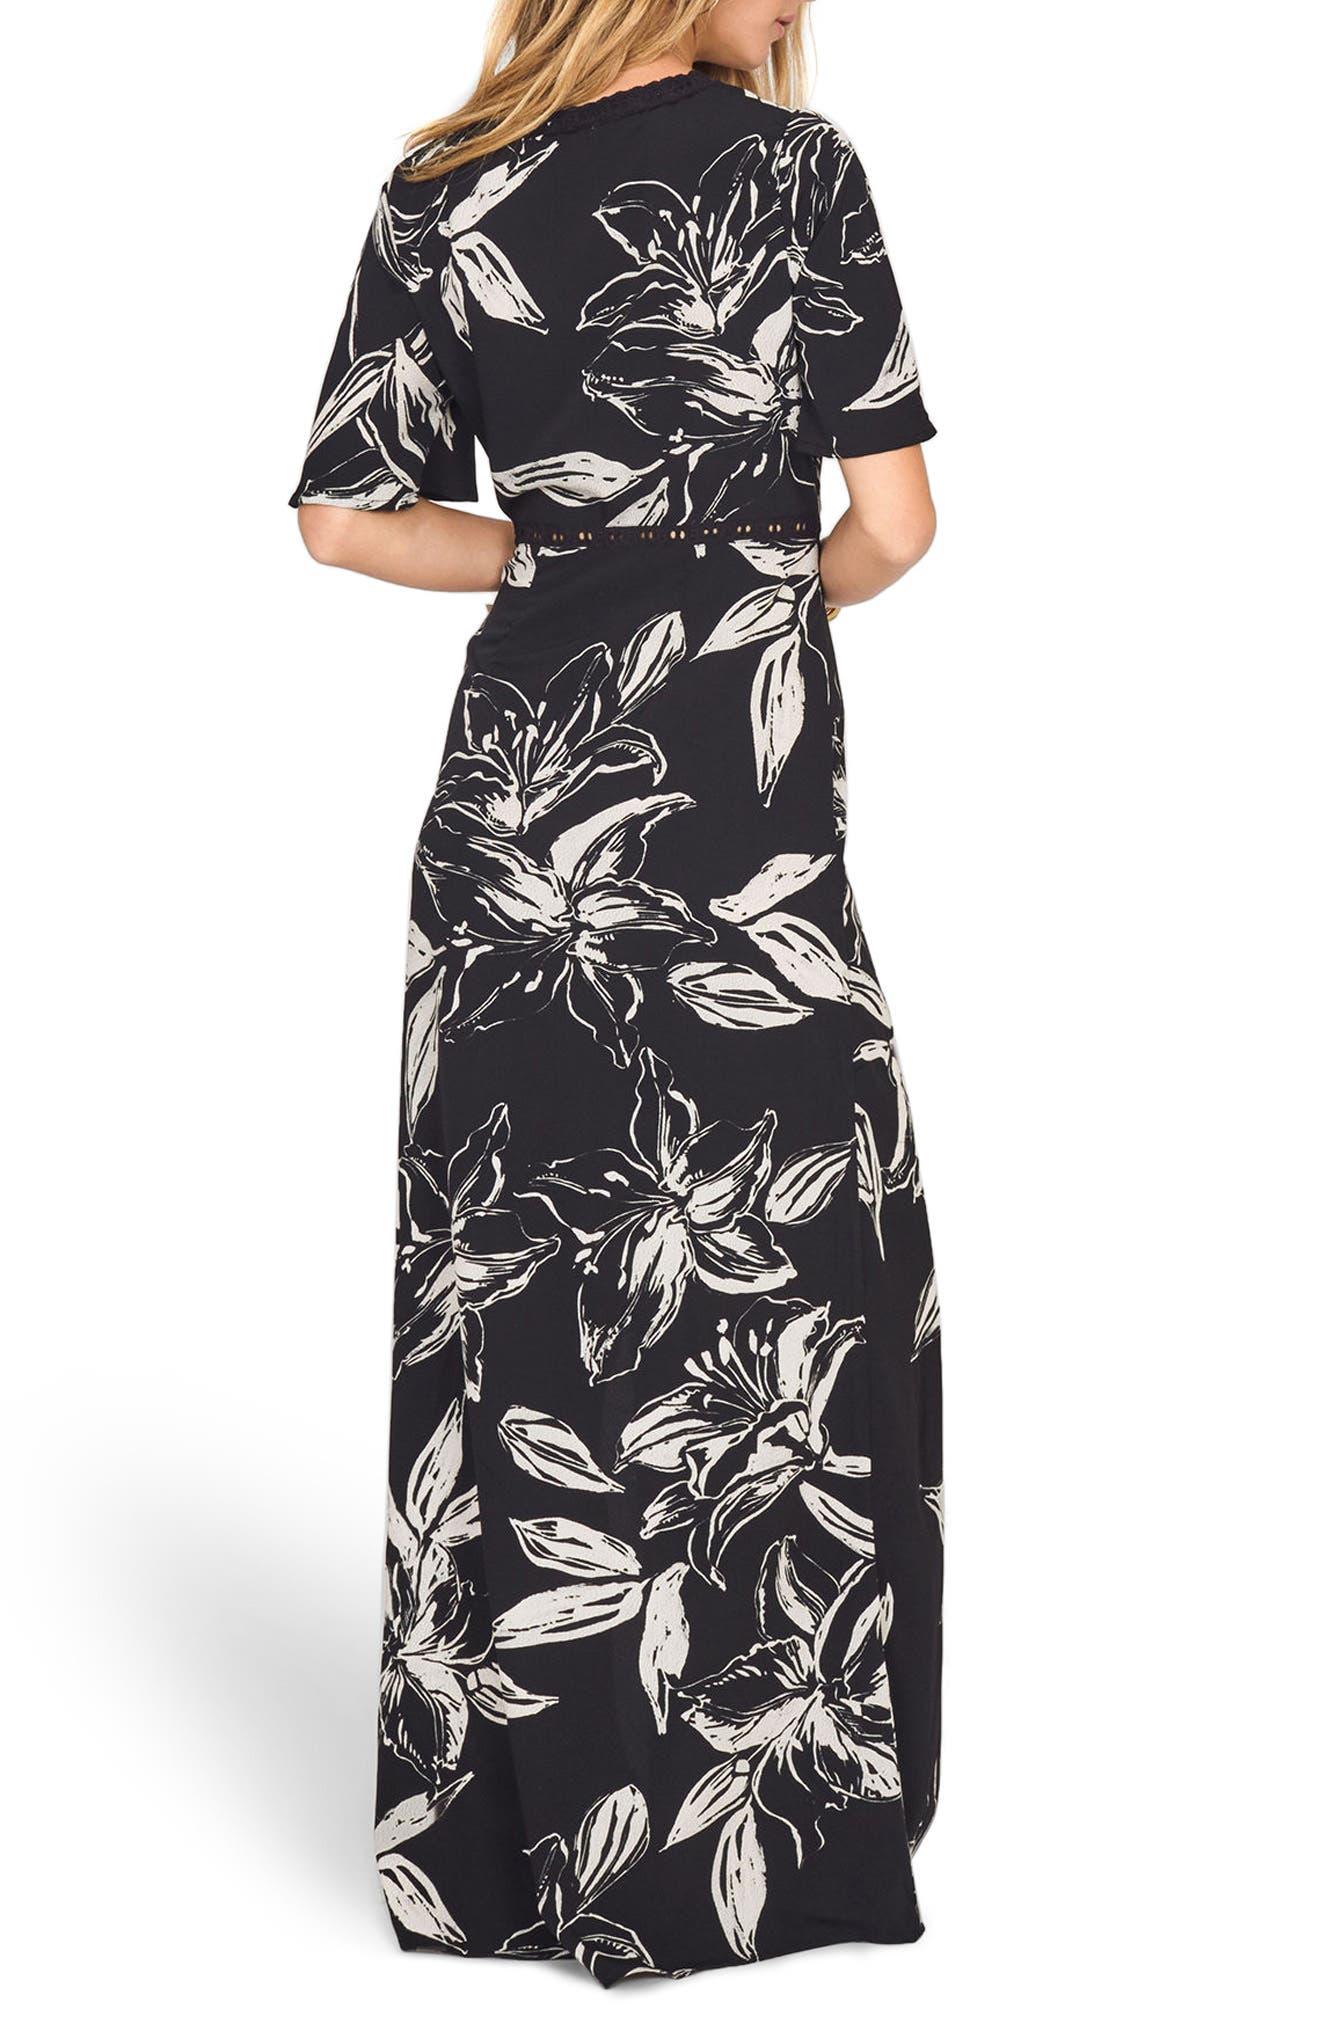 Seaside Floral Print Maxi Dress,                             Alternate thumbnail 3, color,                             Black Sands